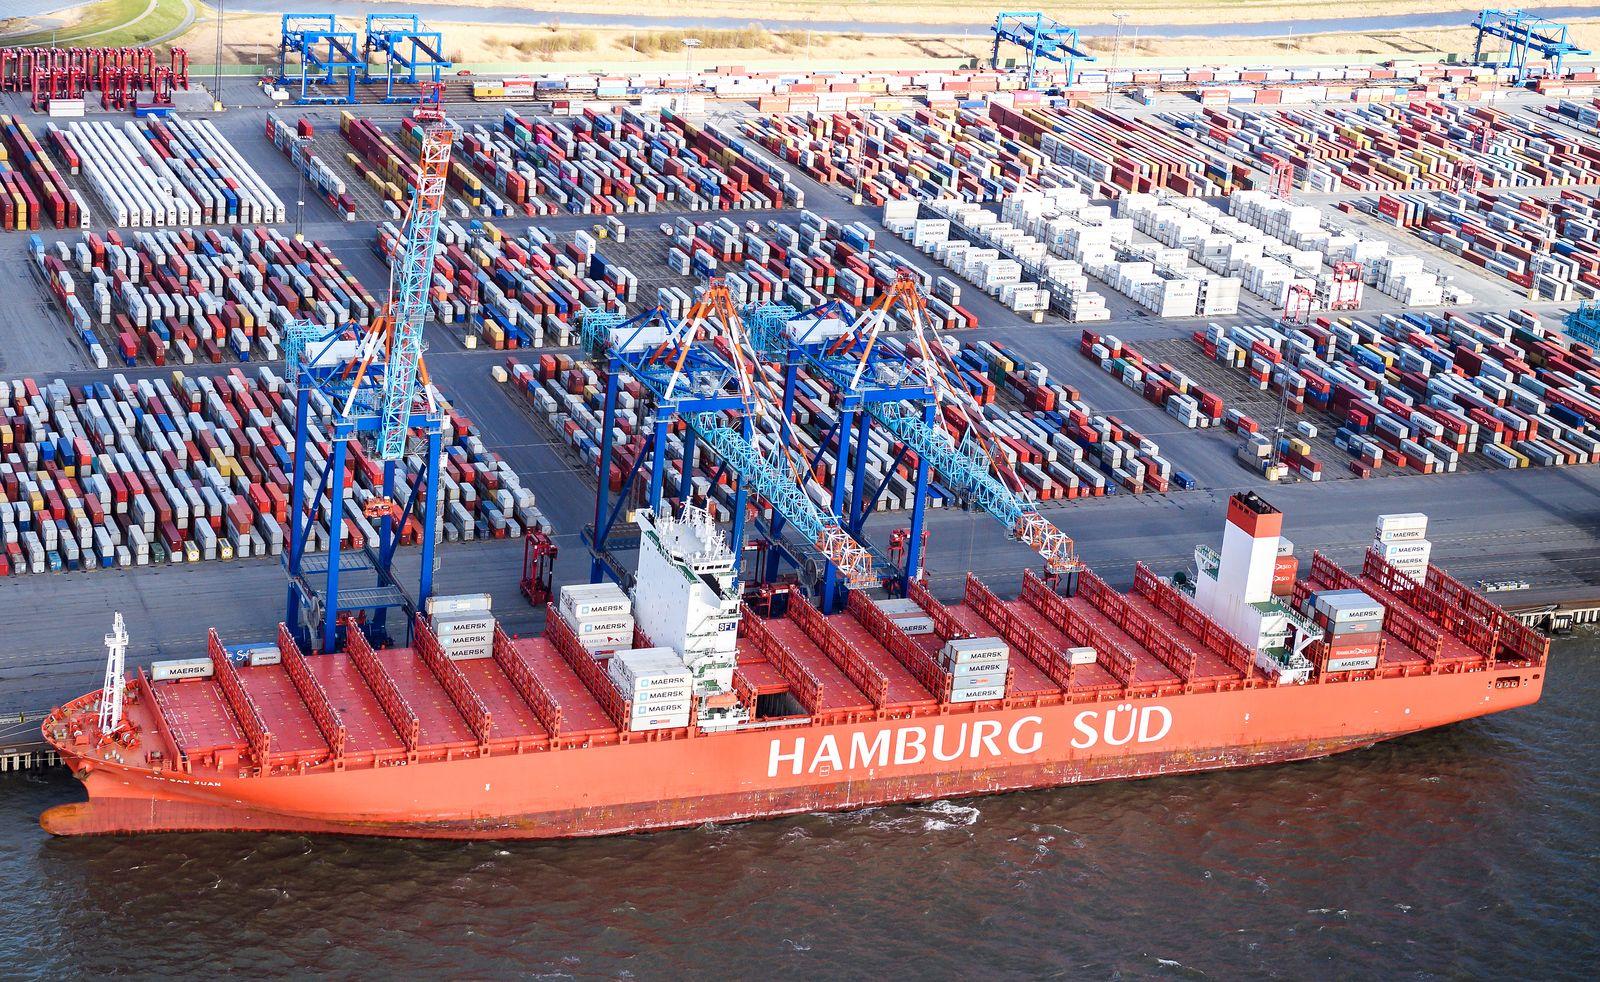 Deutschland / Konjuktur / Export / Container / Bremerhaven